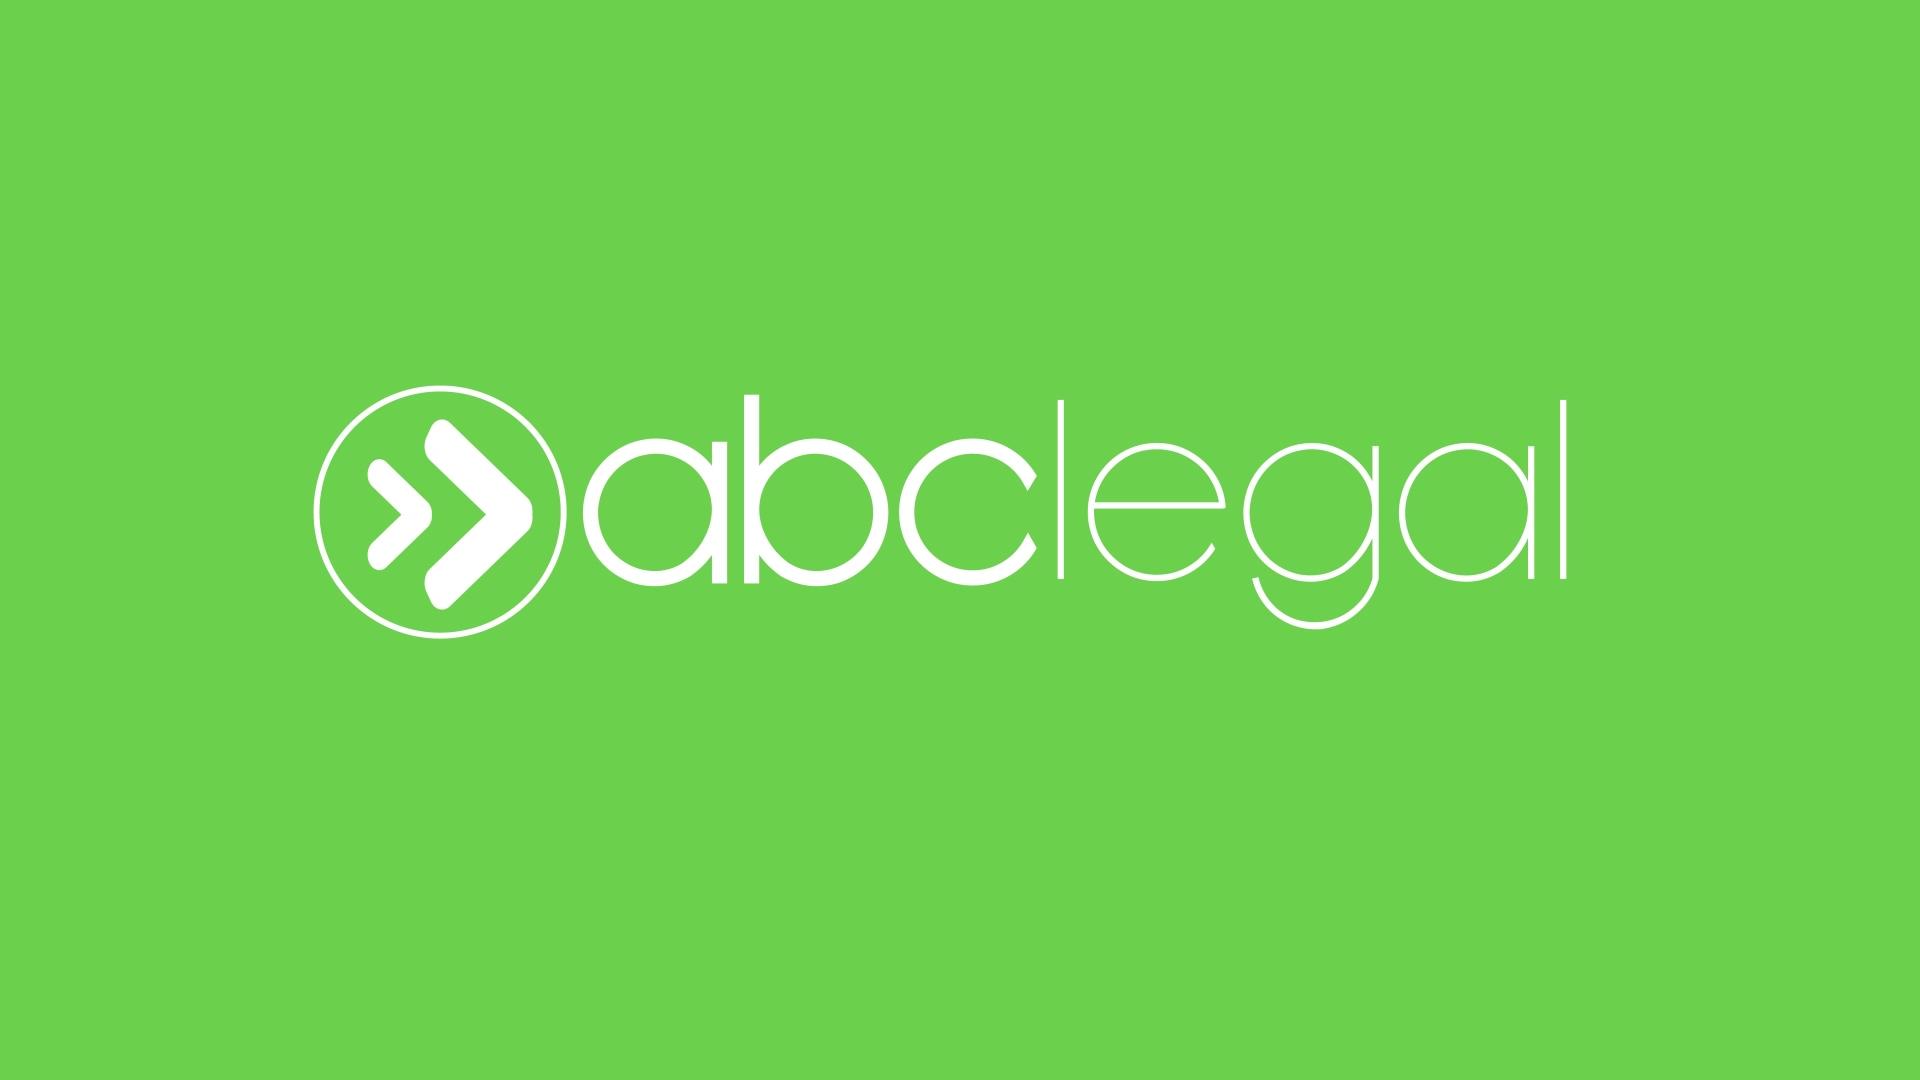 ABC Legal Services Good News